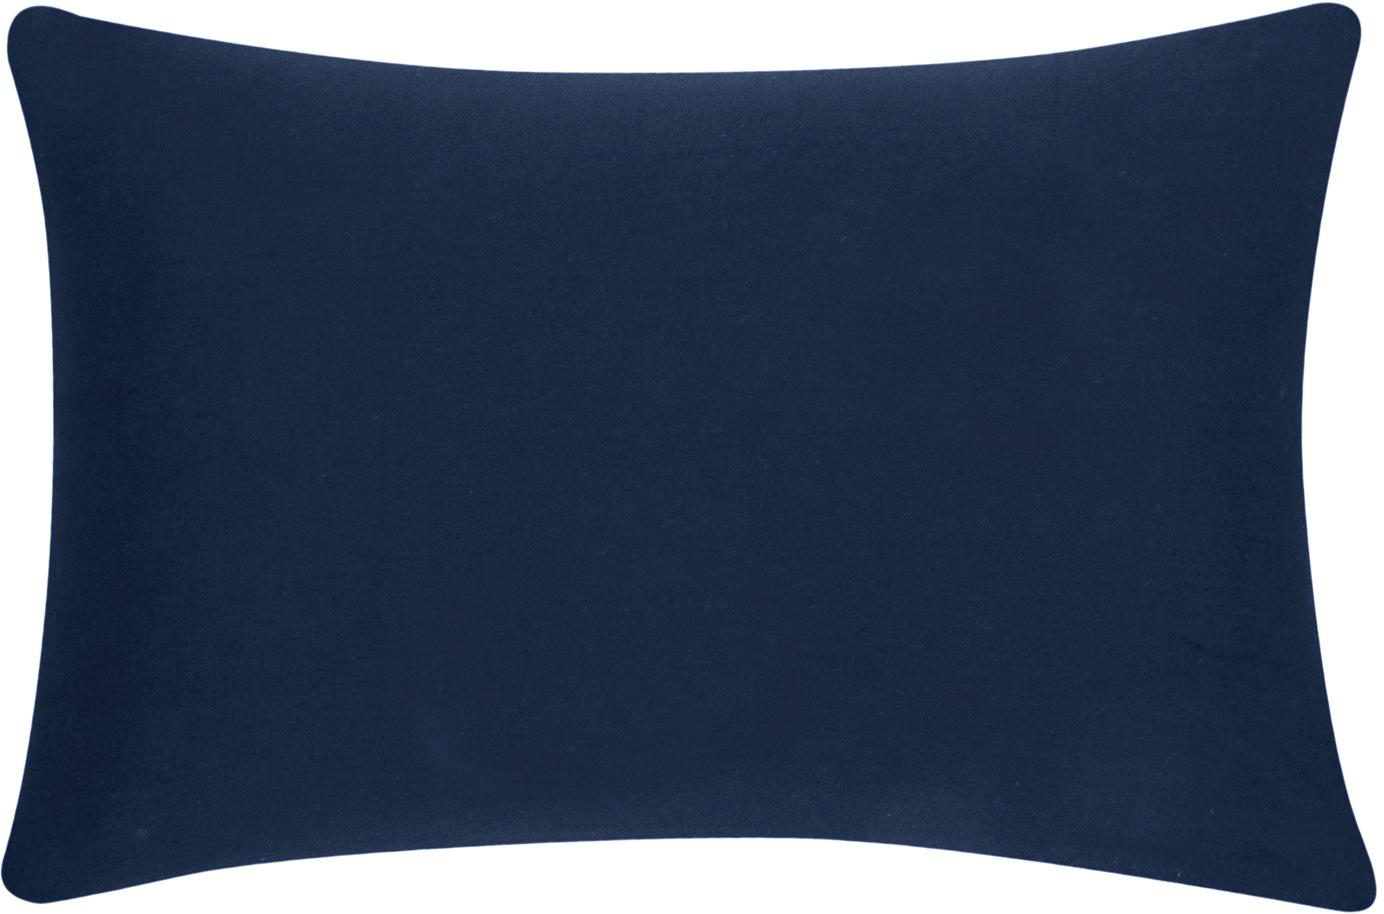 Federa arredo in cotone blu navy Mads, 100% cotone, Blu navy, Larg. 30 x Lung. 50 cm